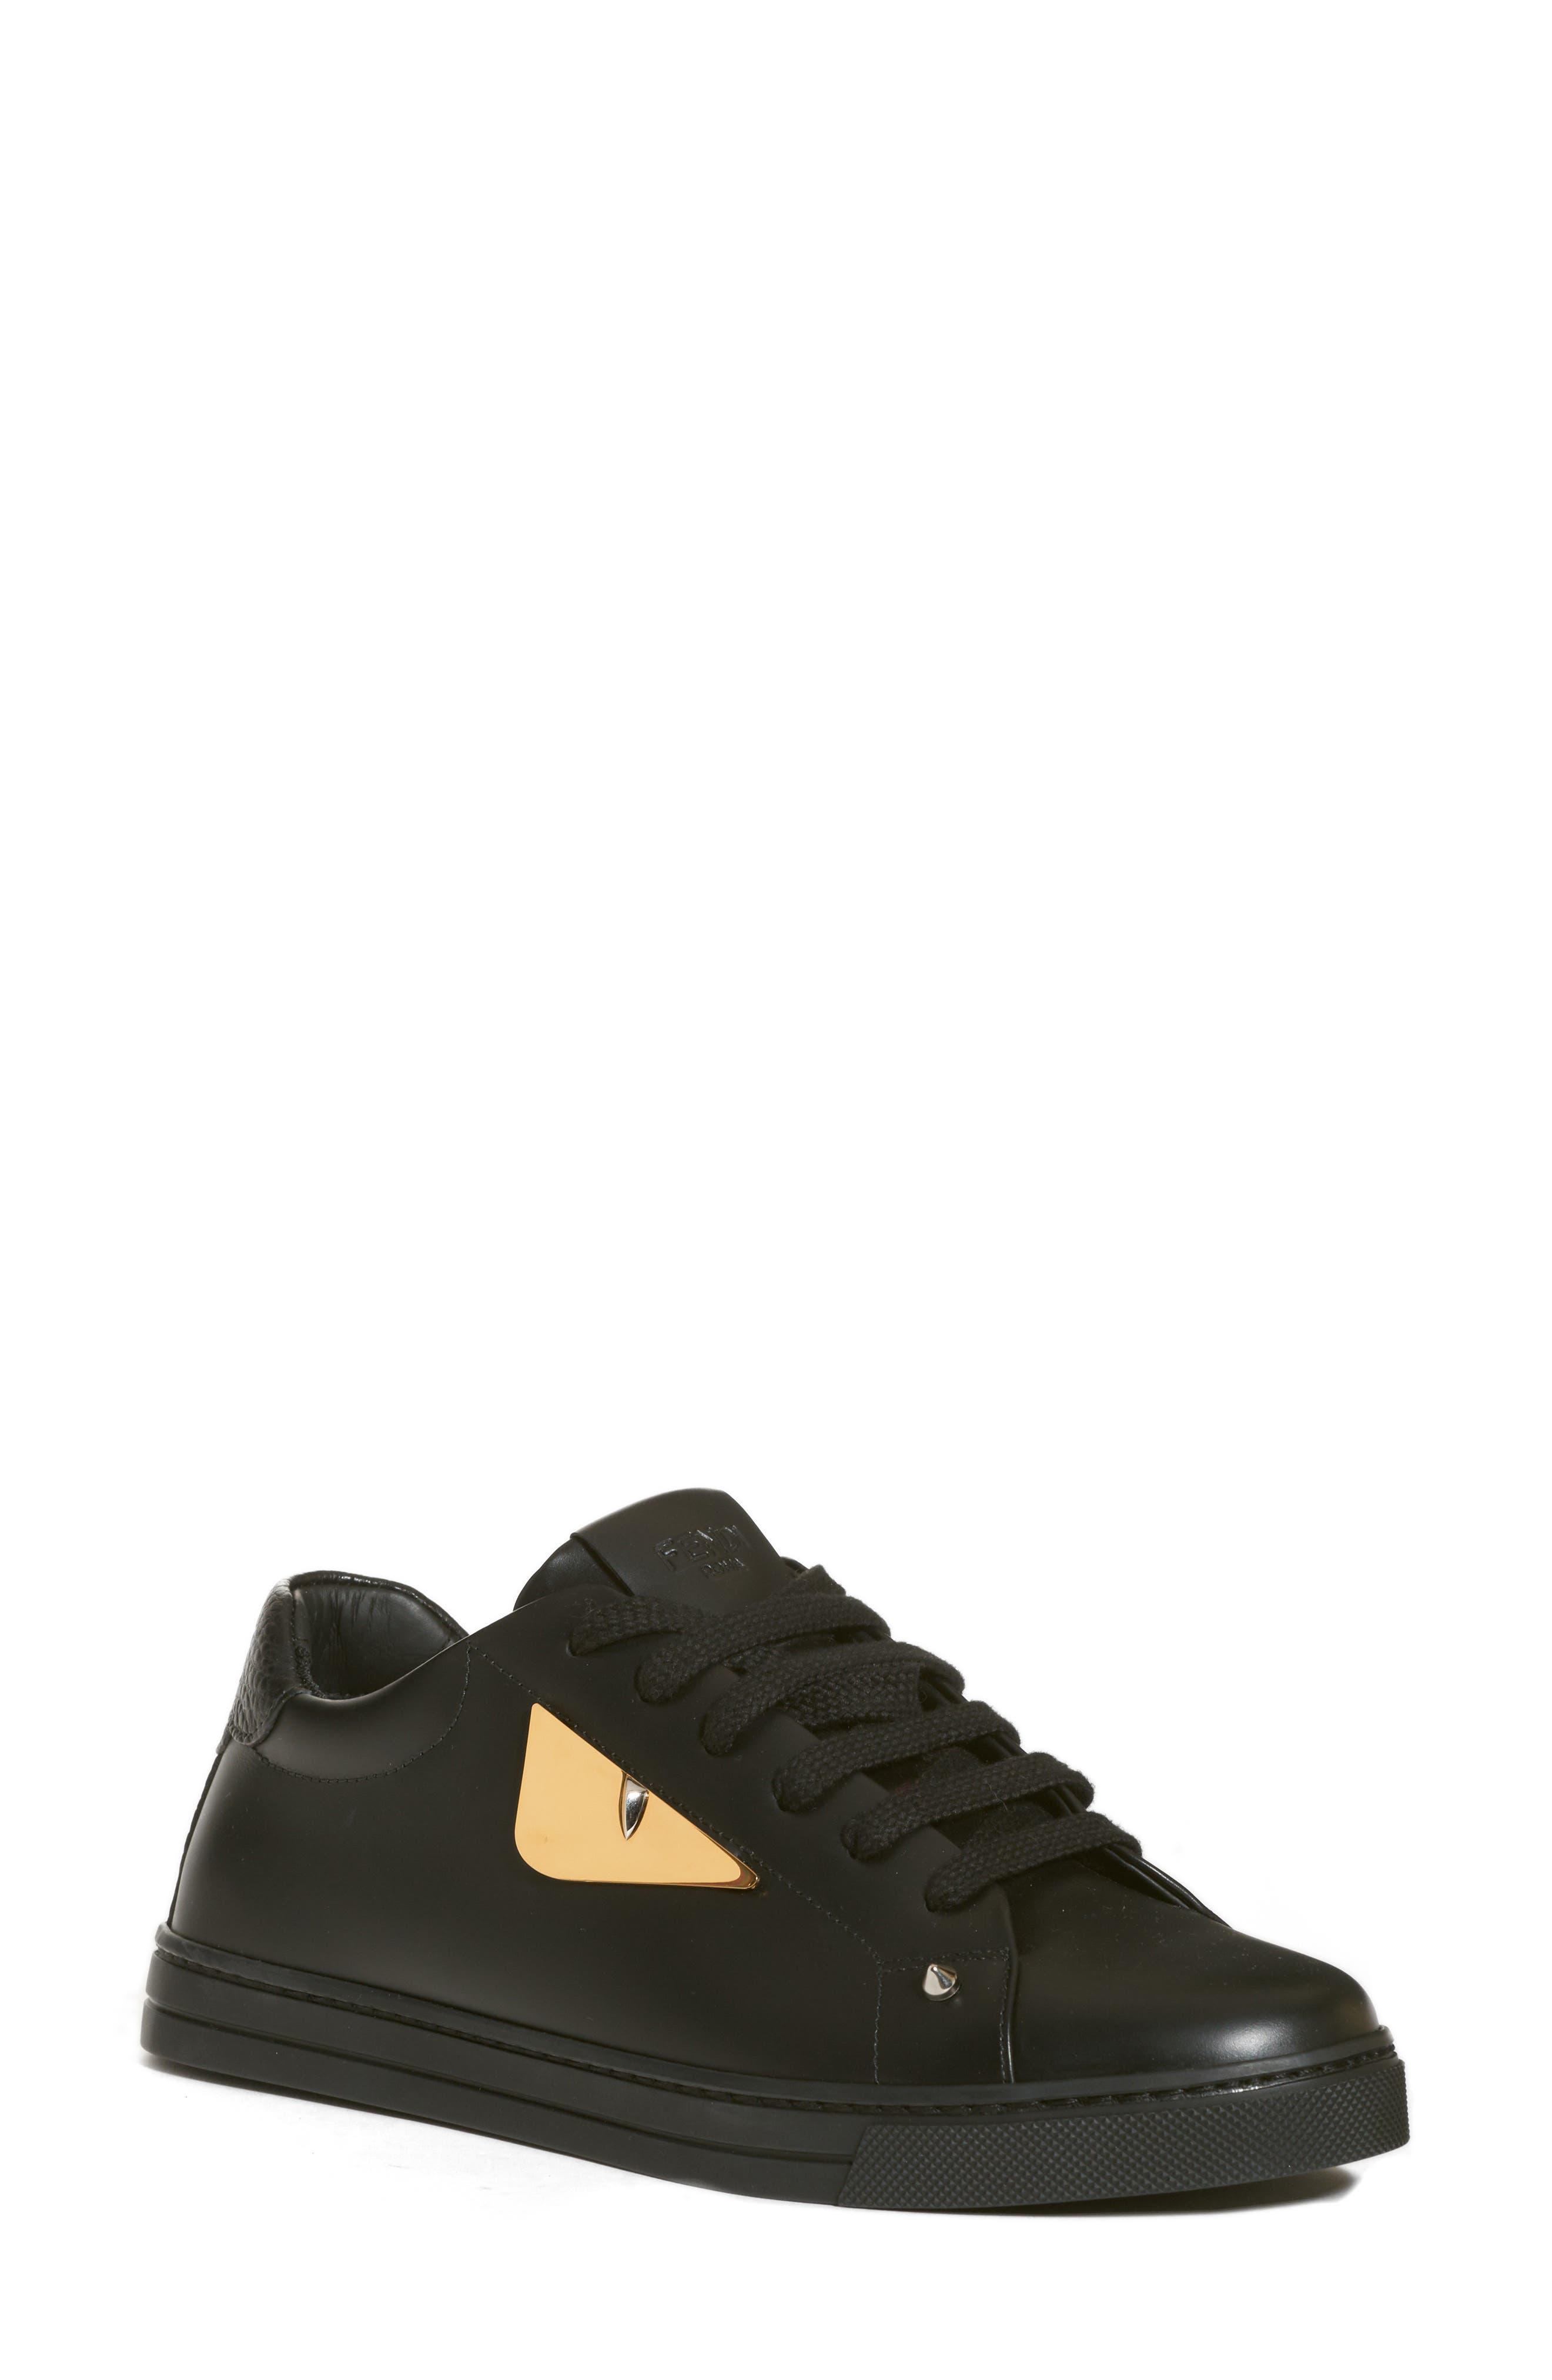 Bugs Sneaker,                             Main thumbnail 1, color,                             BLACK